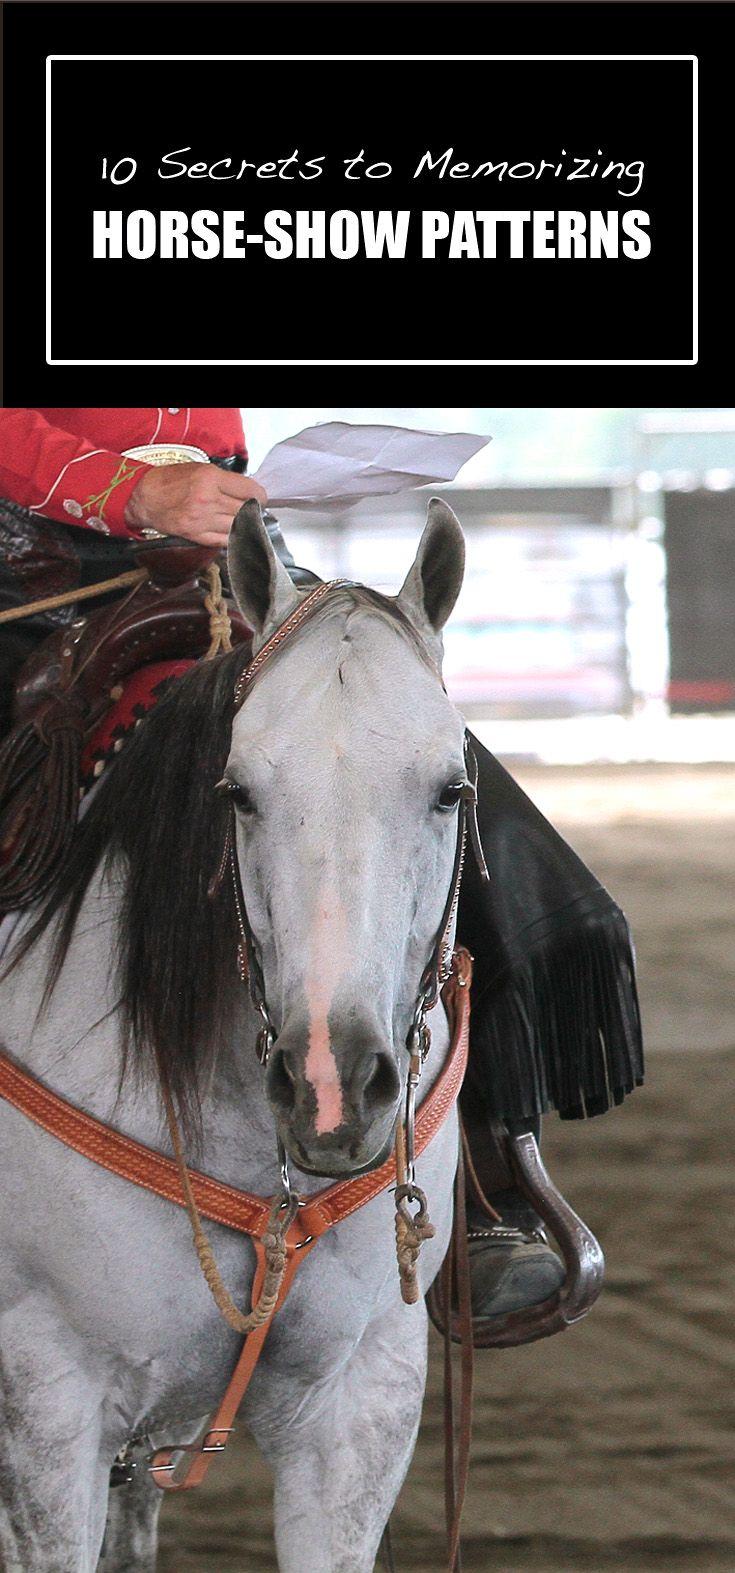 Best Kept Secrets For Memorizing Horse Show Patterns